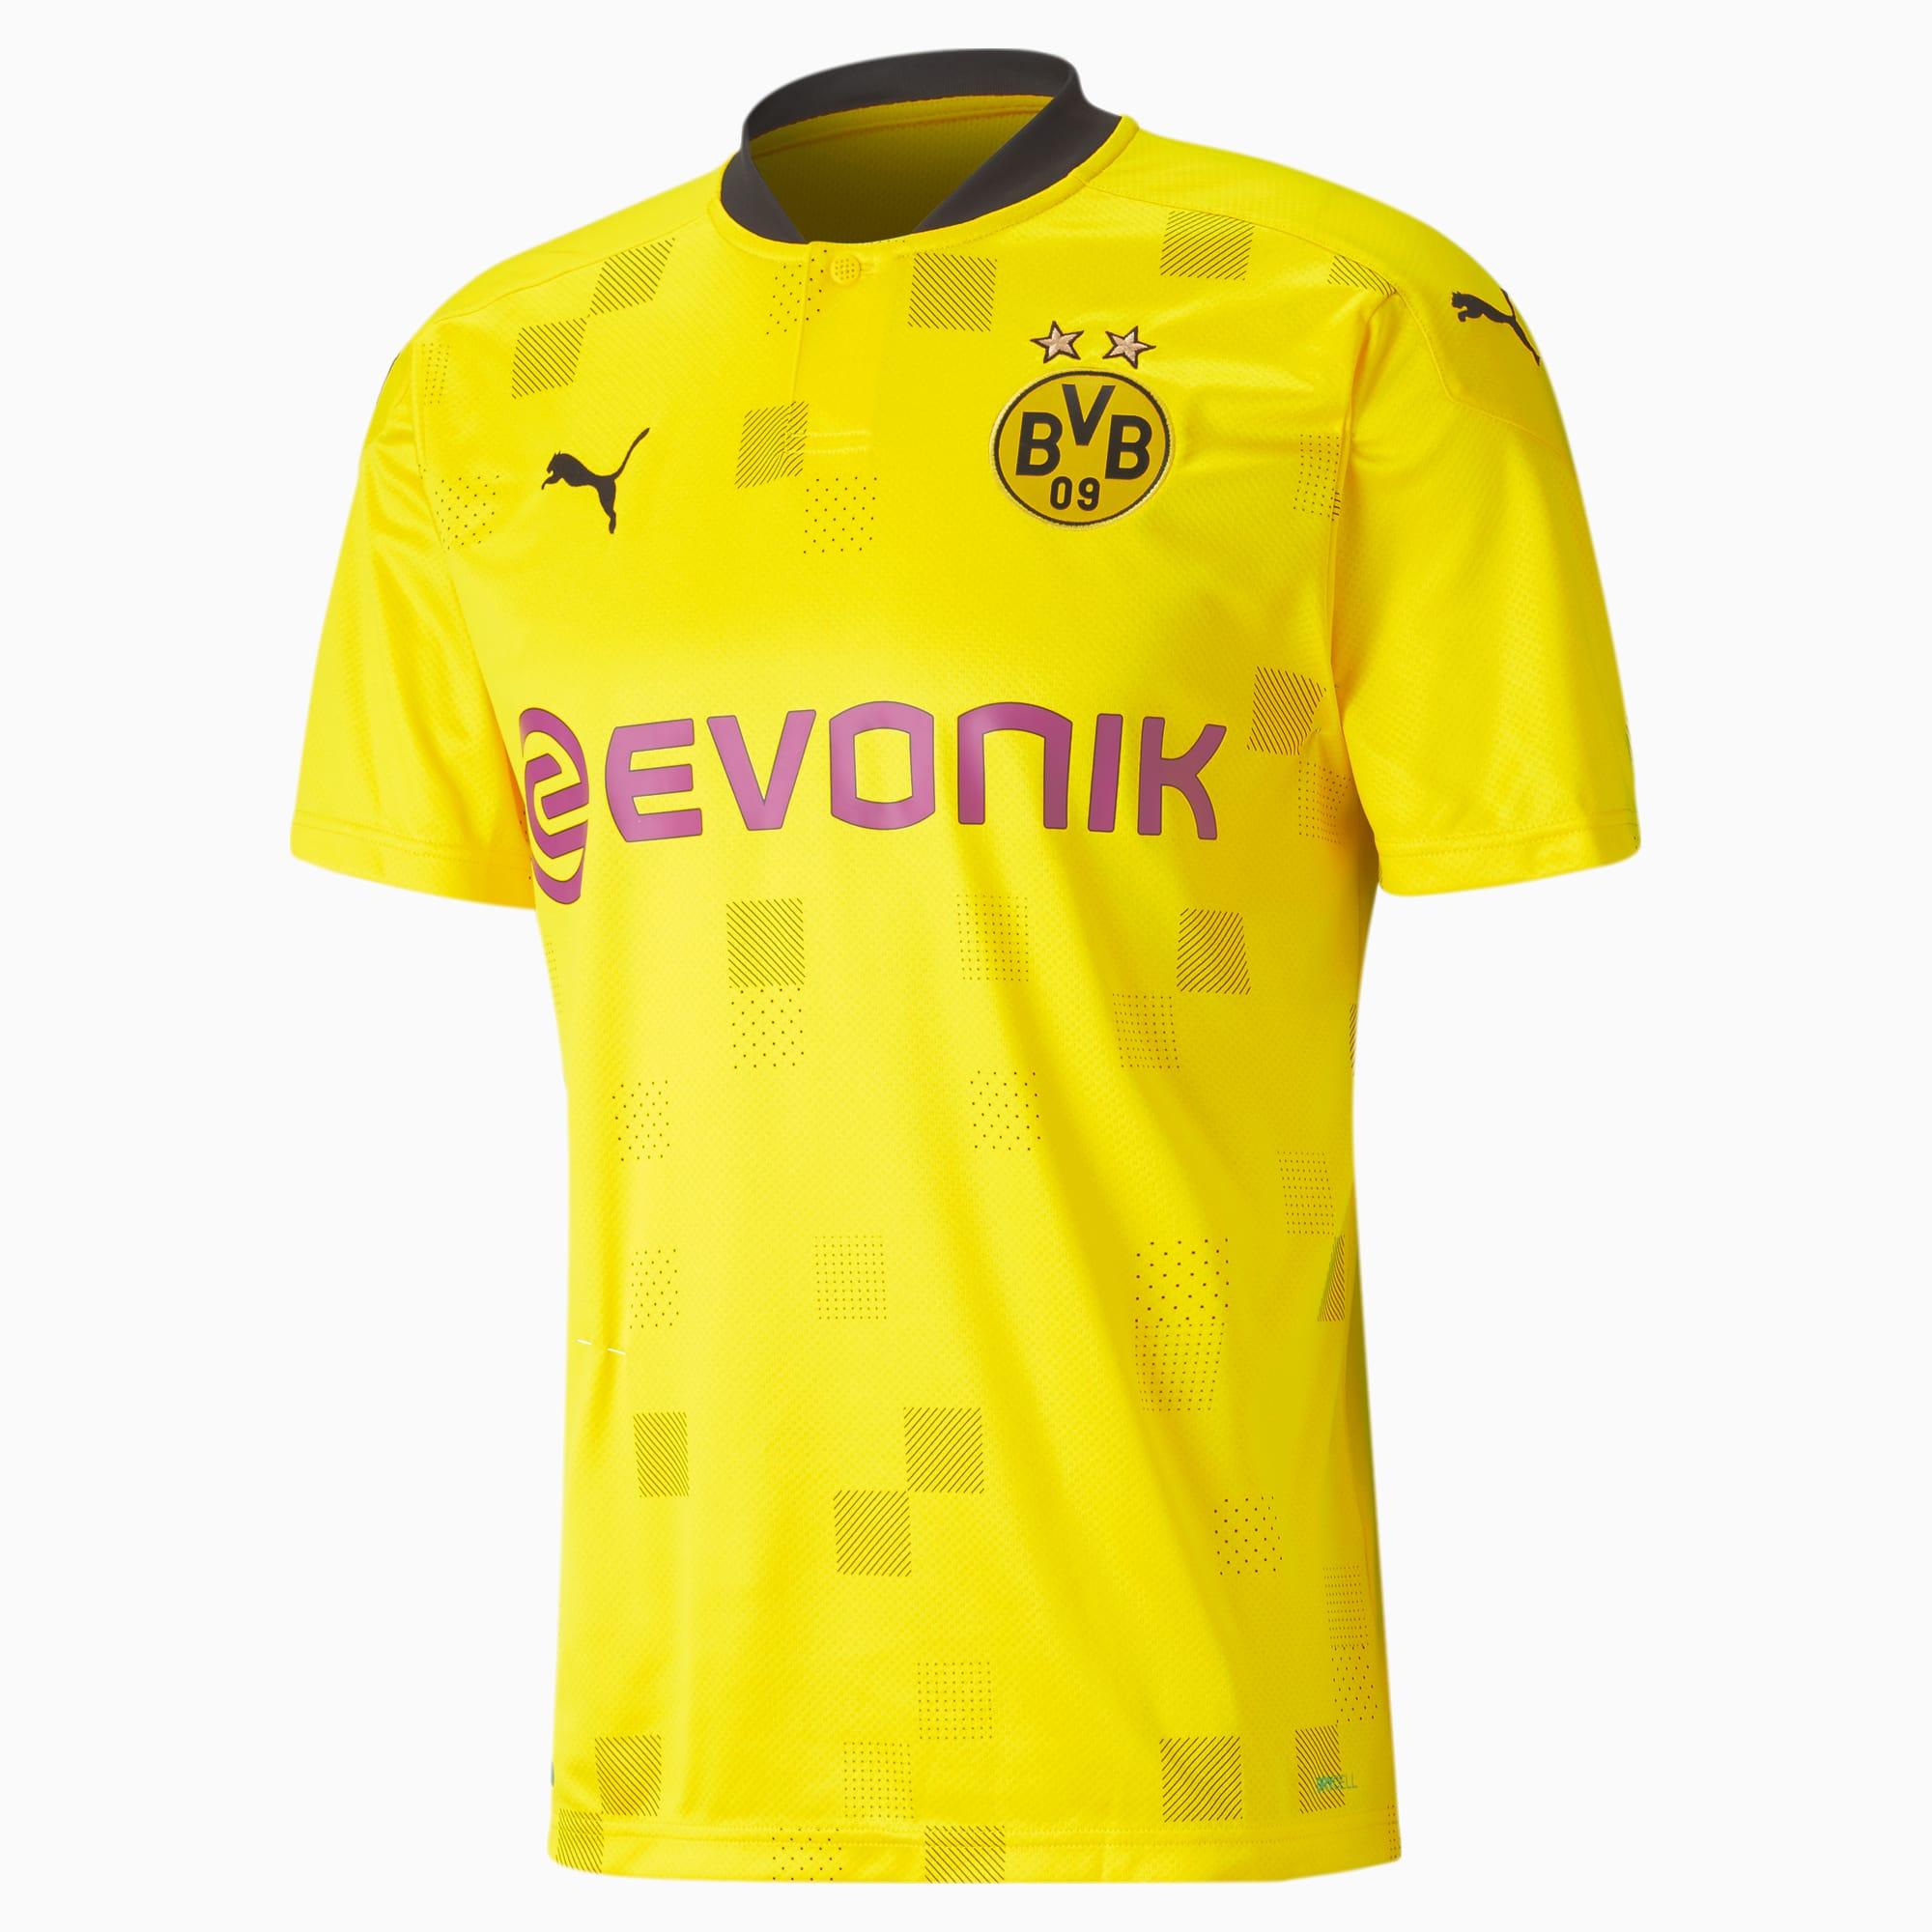 PUMA BVB Cup Replica Jugend Fußball Trikot Für Kinder | Mit Aucun | Gelb/Schwarz